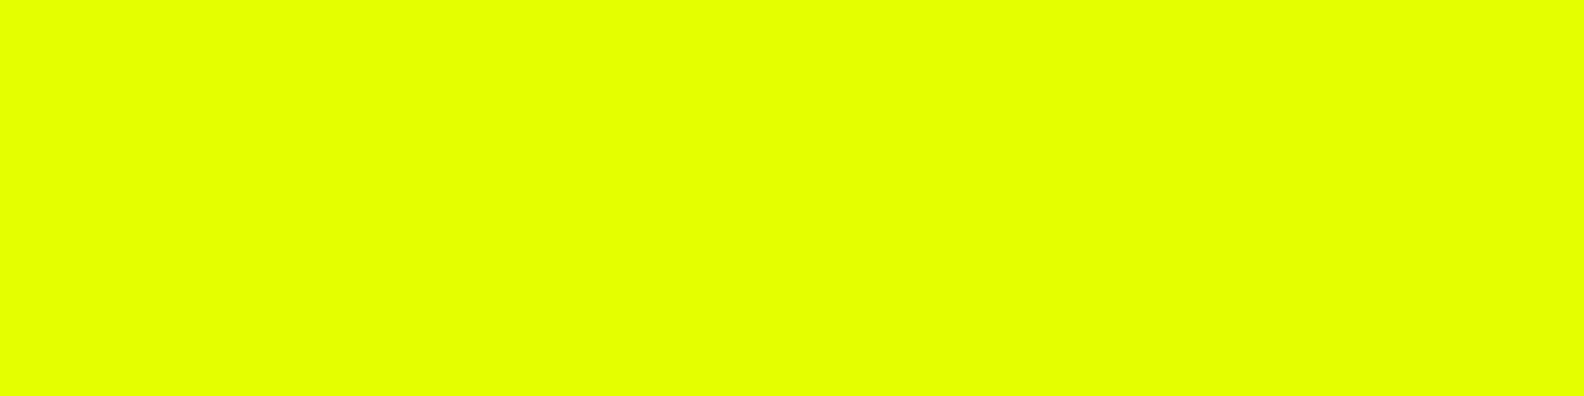 1584x396 Lemon Lime Solid Color Background